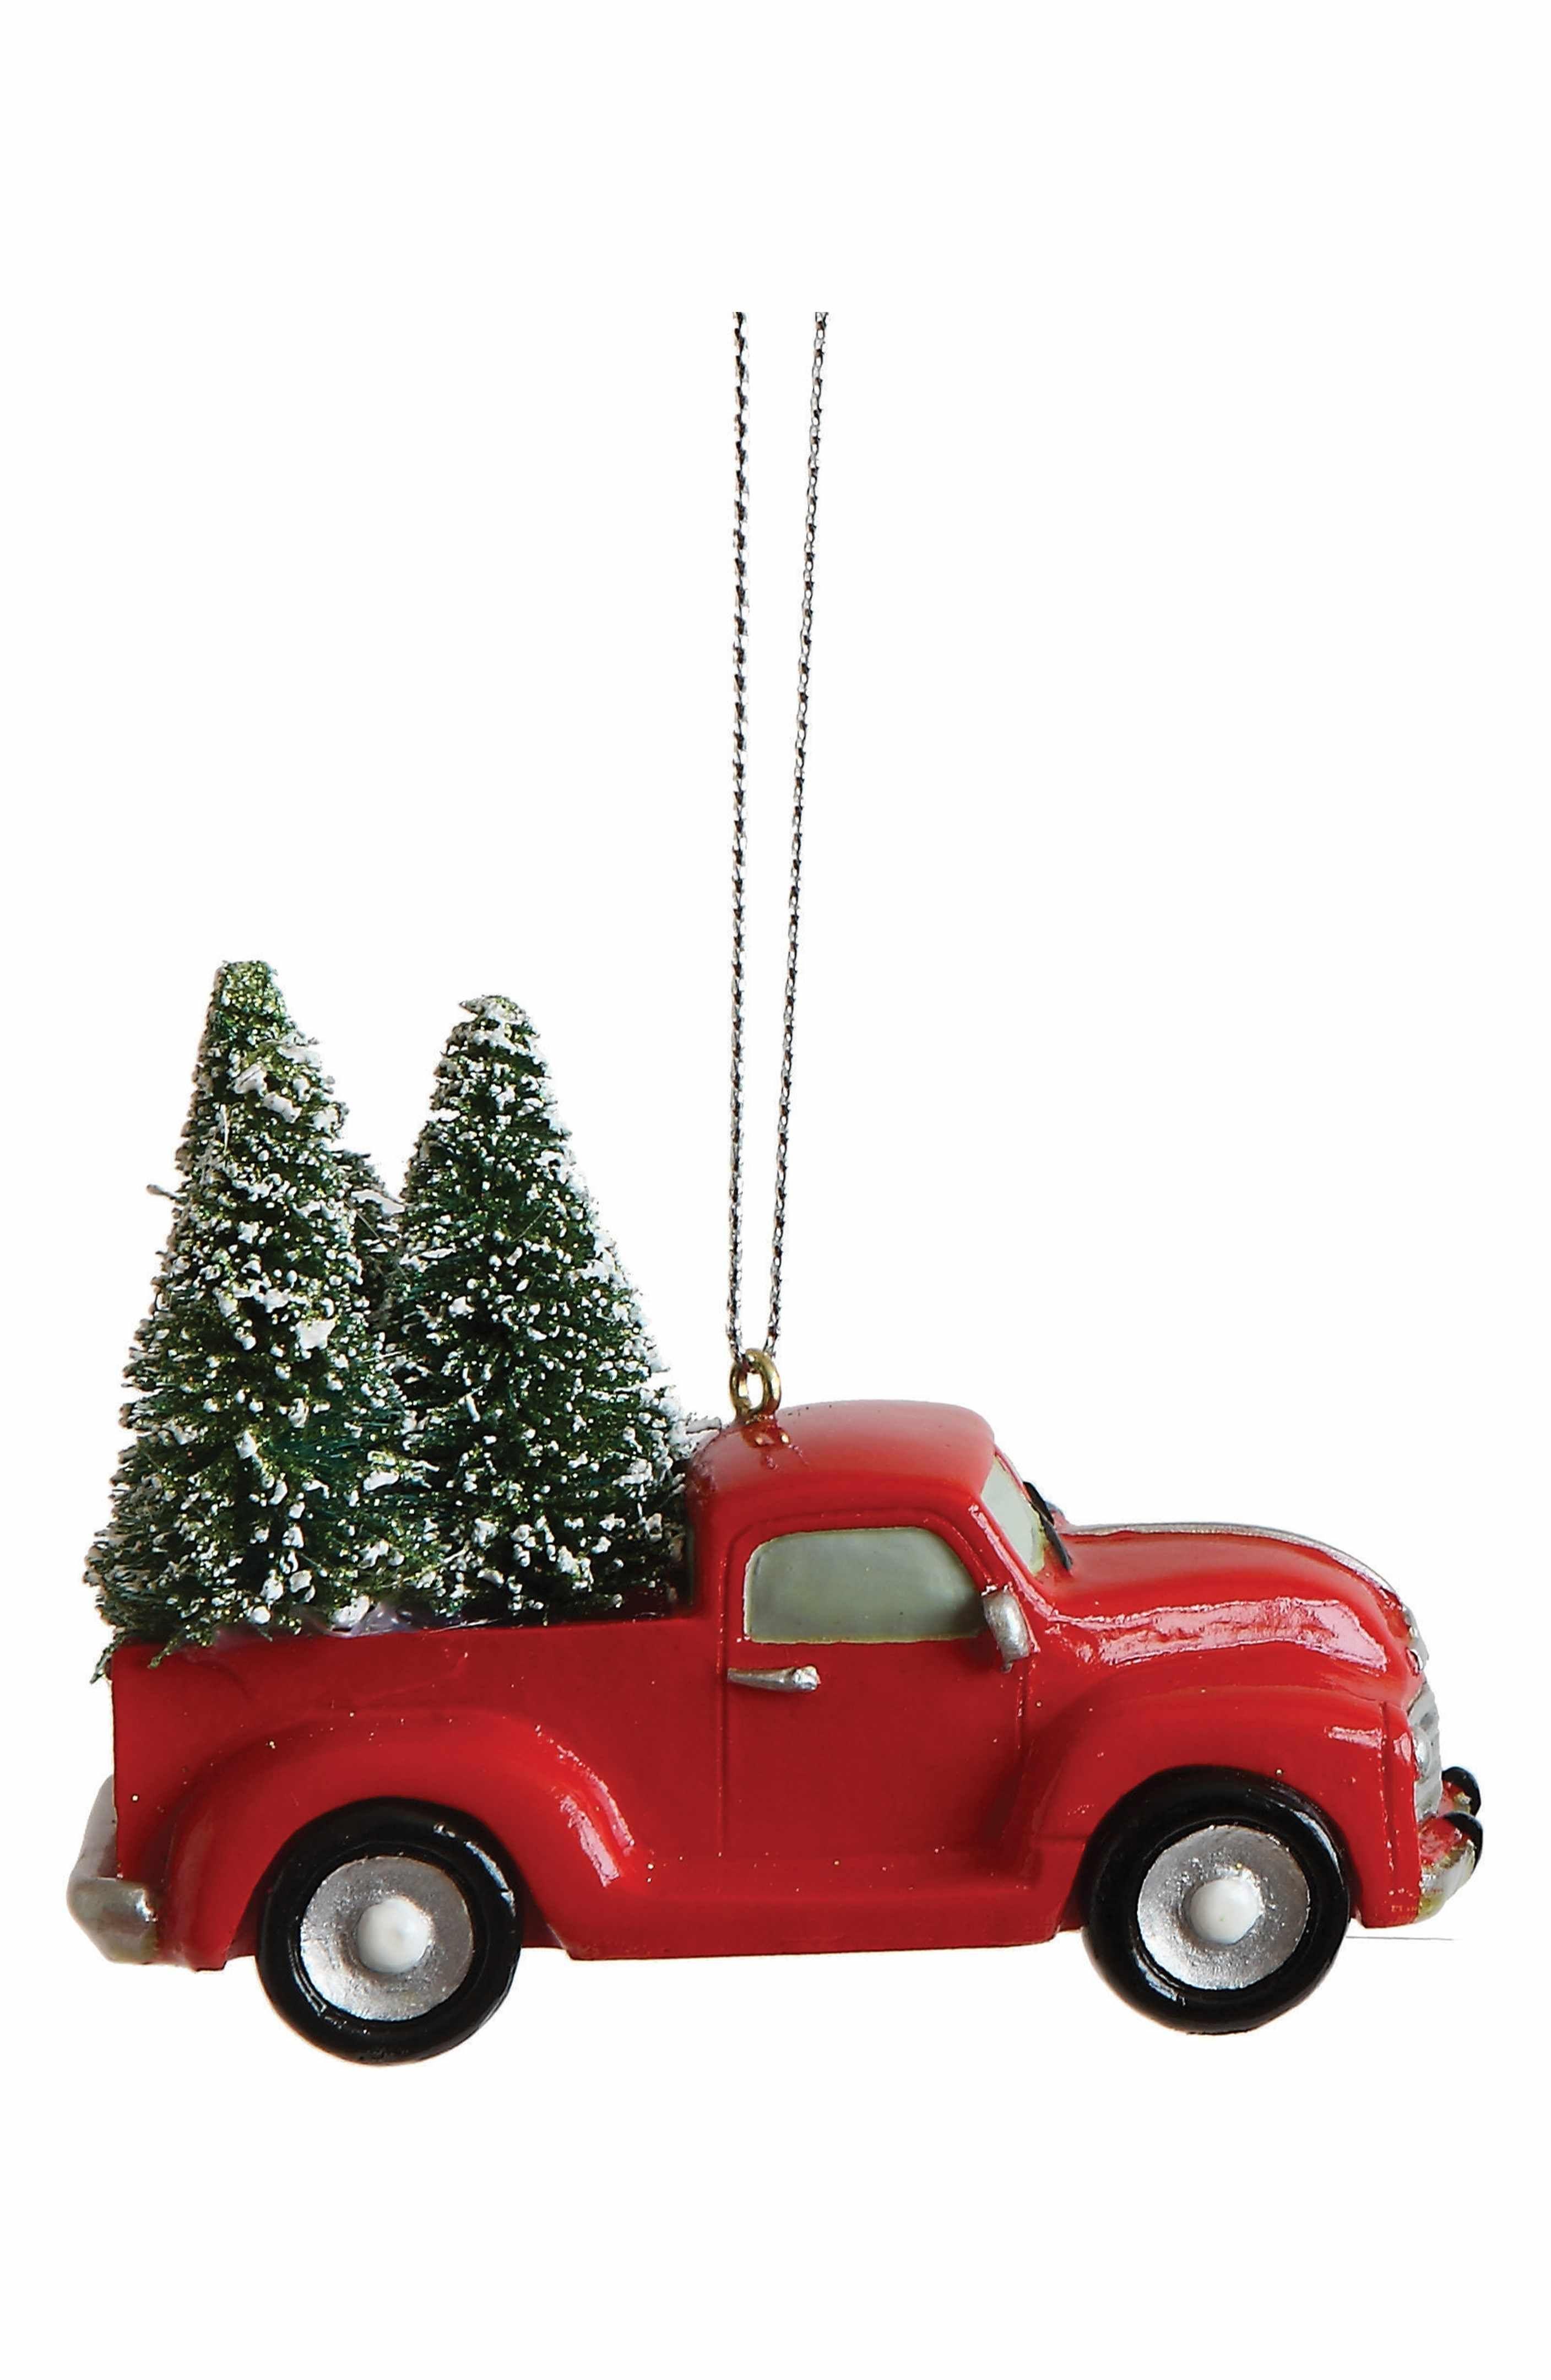 Main Image Creative Co Op Truck Ornament Christmas Red Truck Christmas Car Vintage Christmas